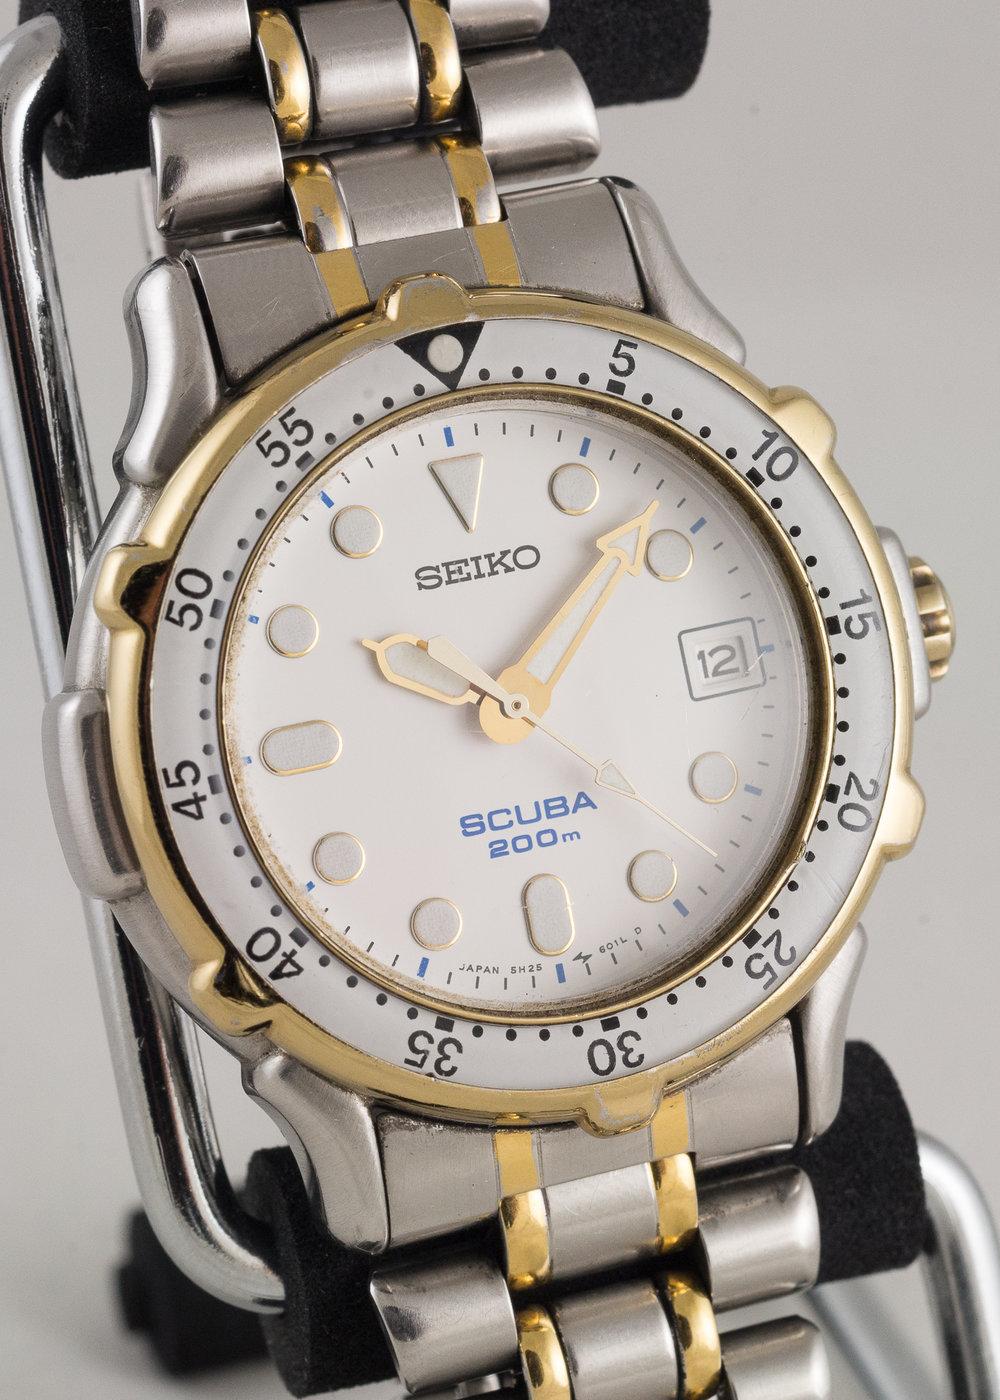 5M25-6020 Seiko